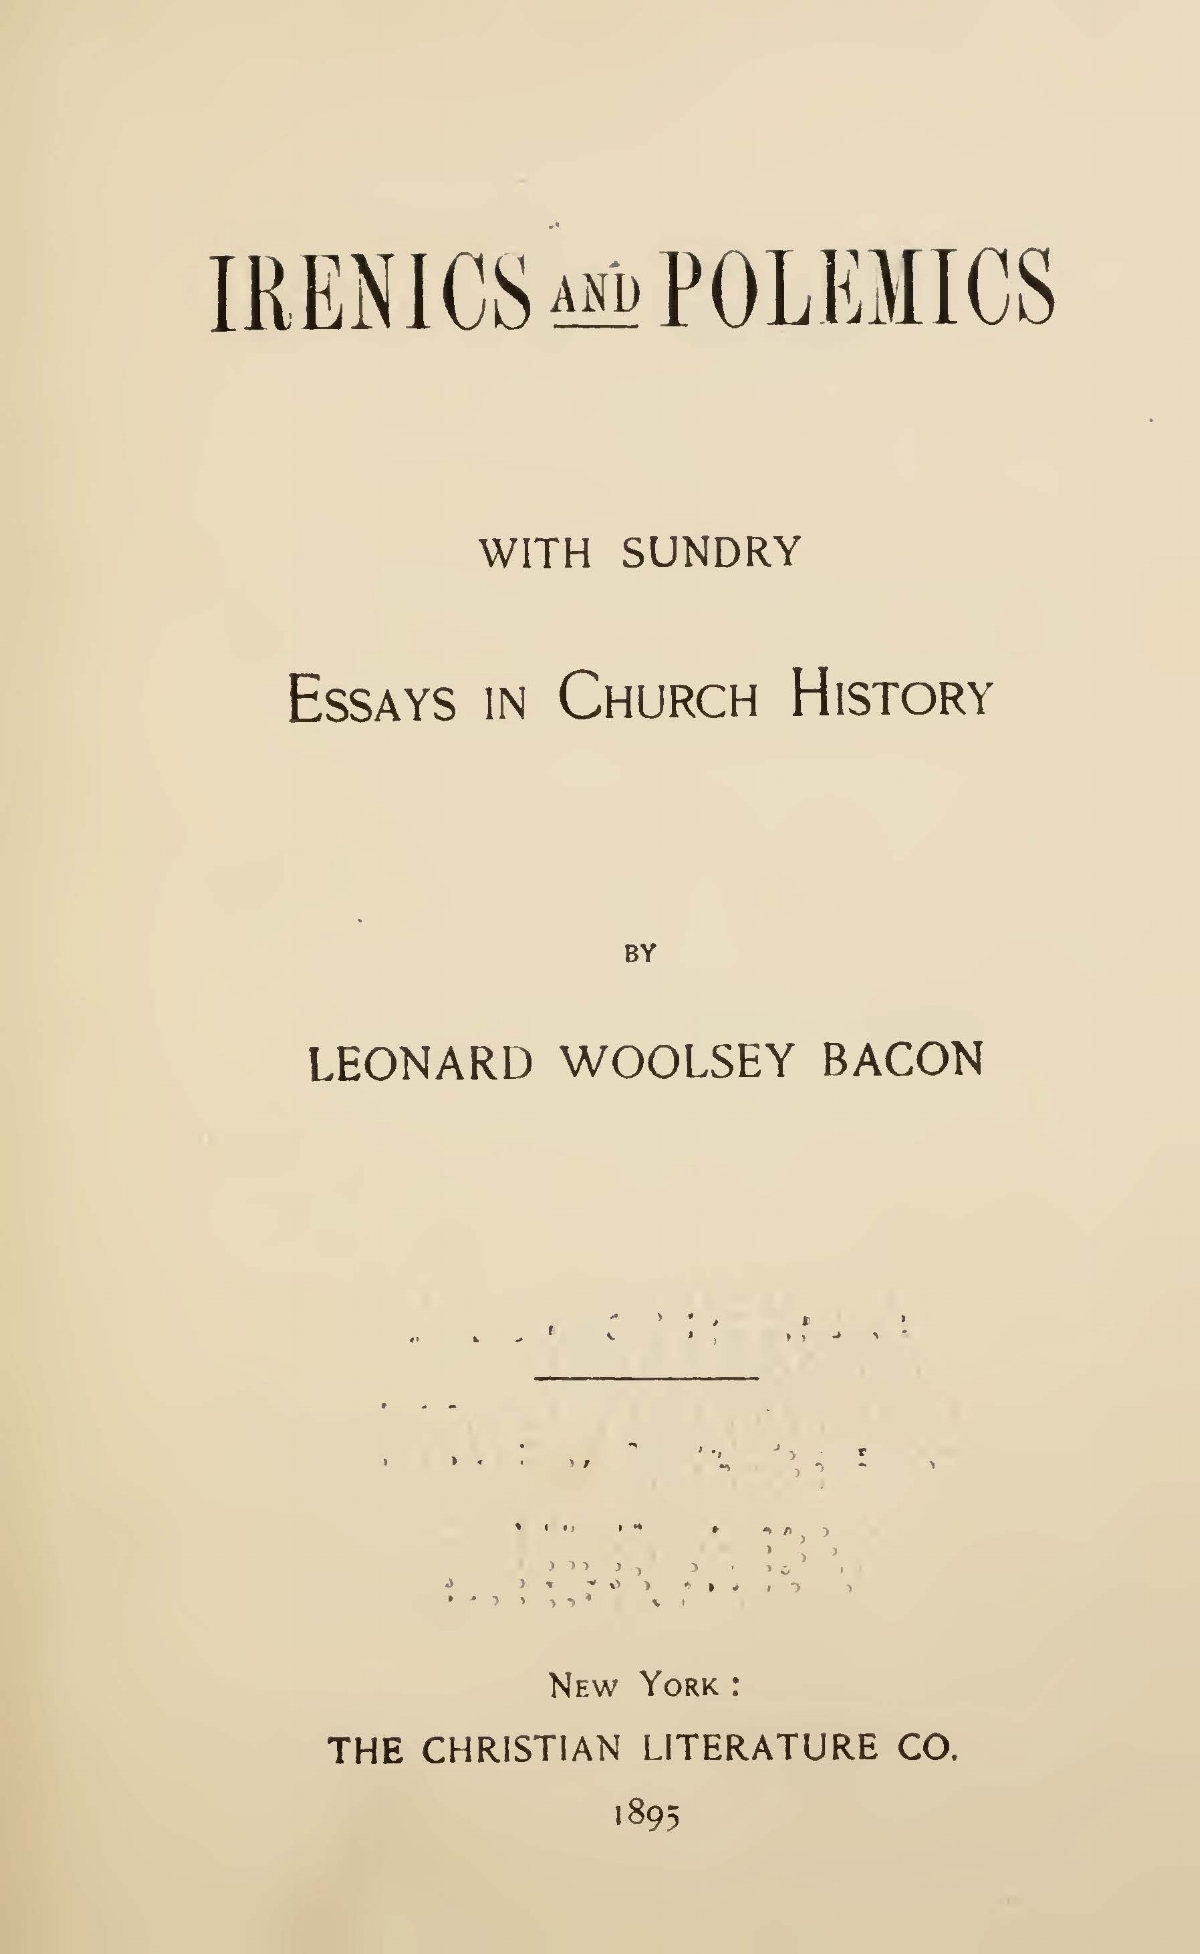 Bacon, Leonard Woolsey, Irenics and Polemics Title Page.jpg